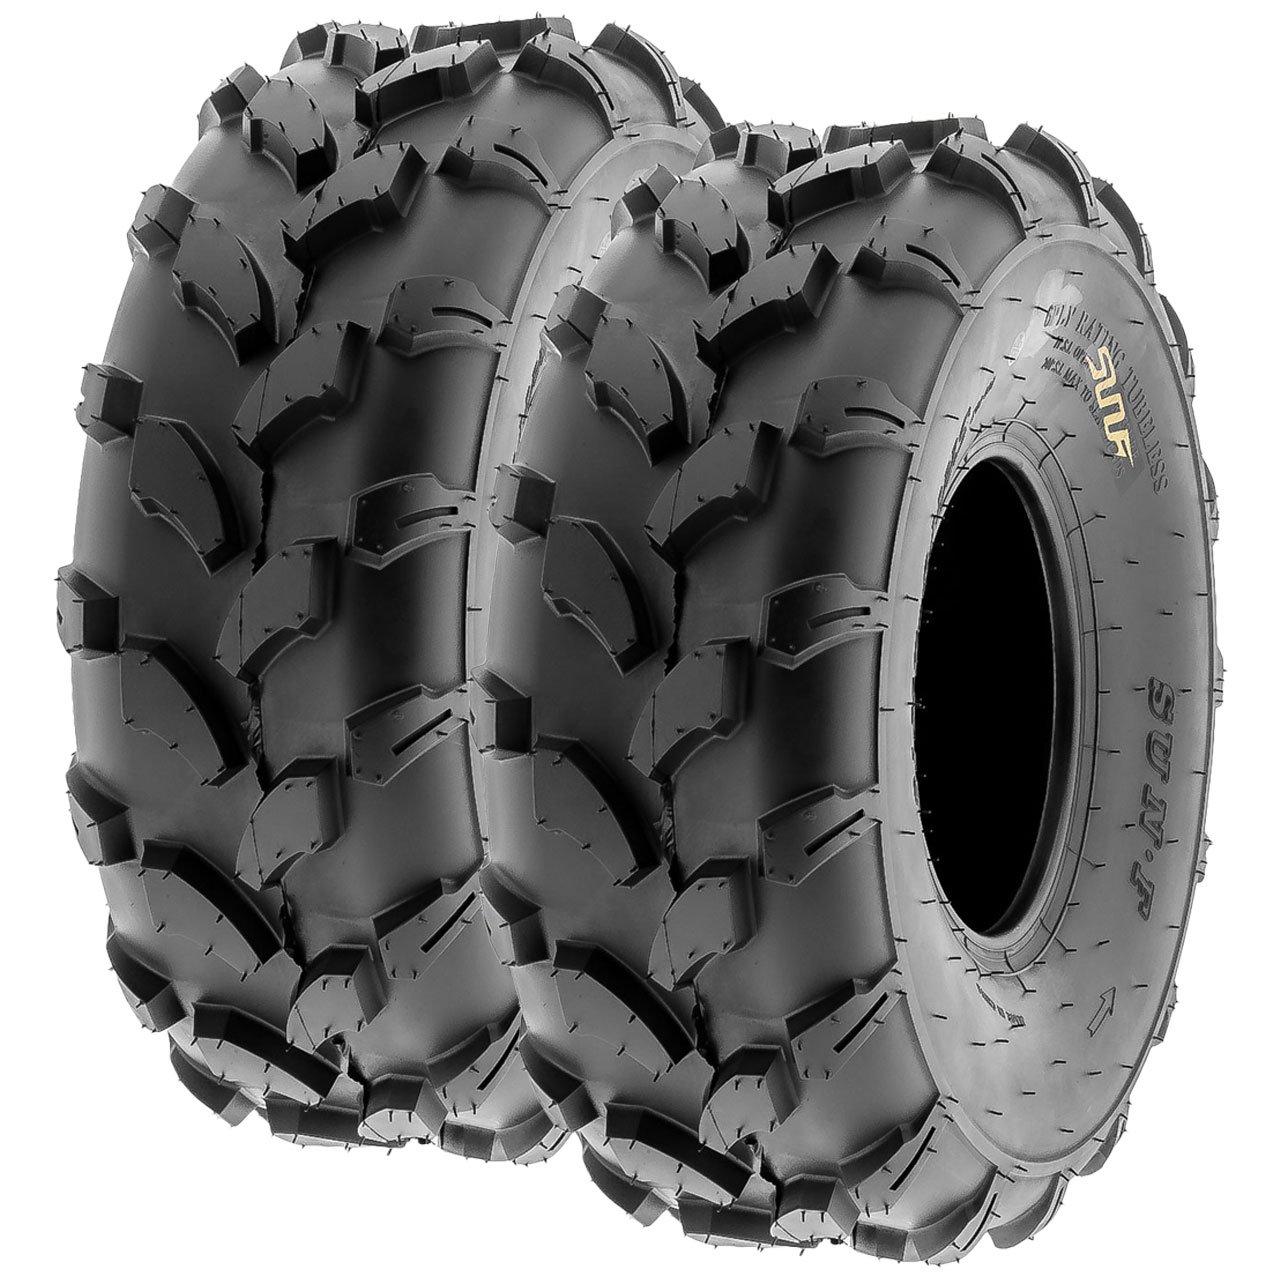 SunF A003 ATV//UTV//Lawn-Mowers Off-Road Tire 18x7-8 Directional Tread 6 PR Pair of 2